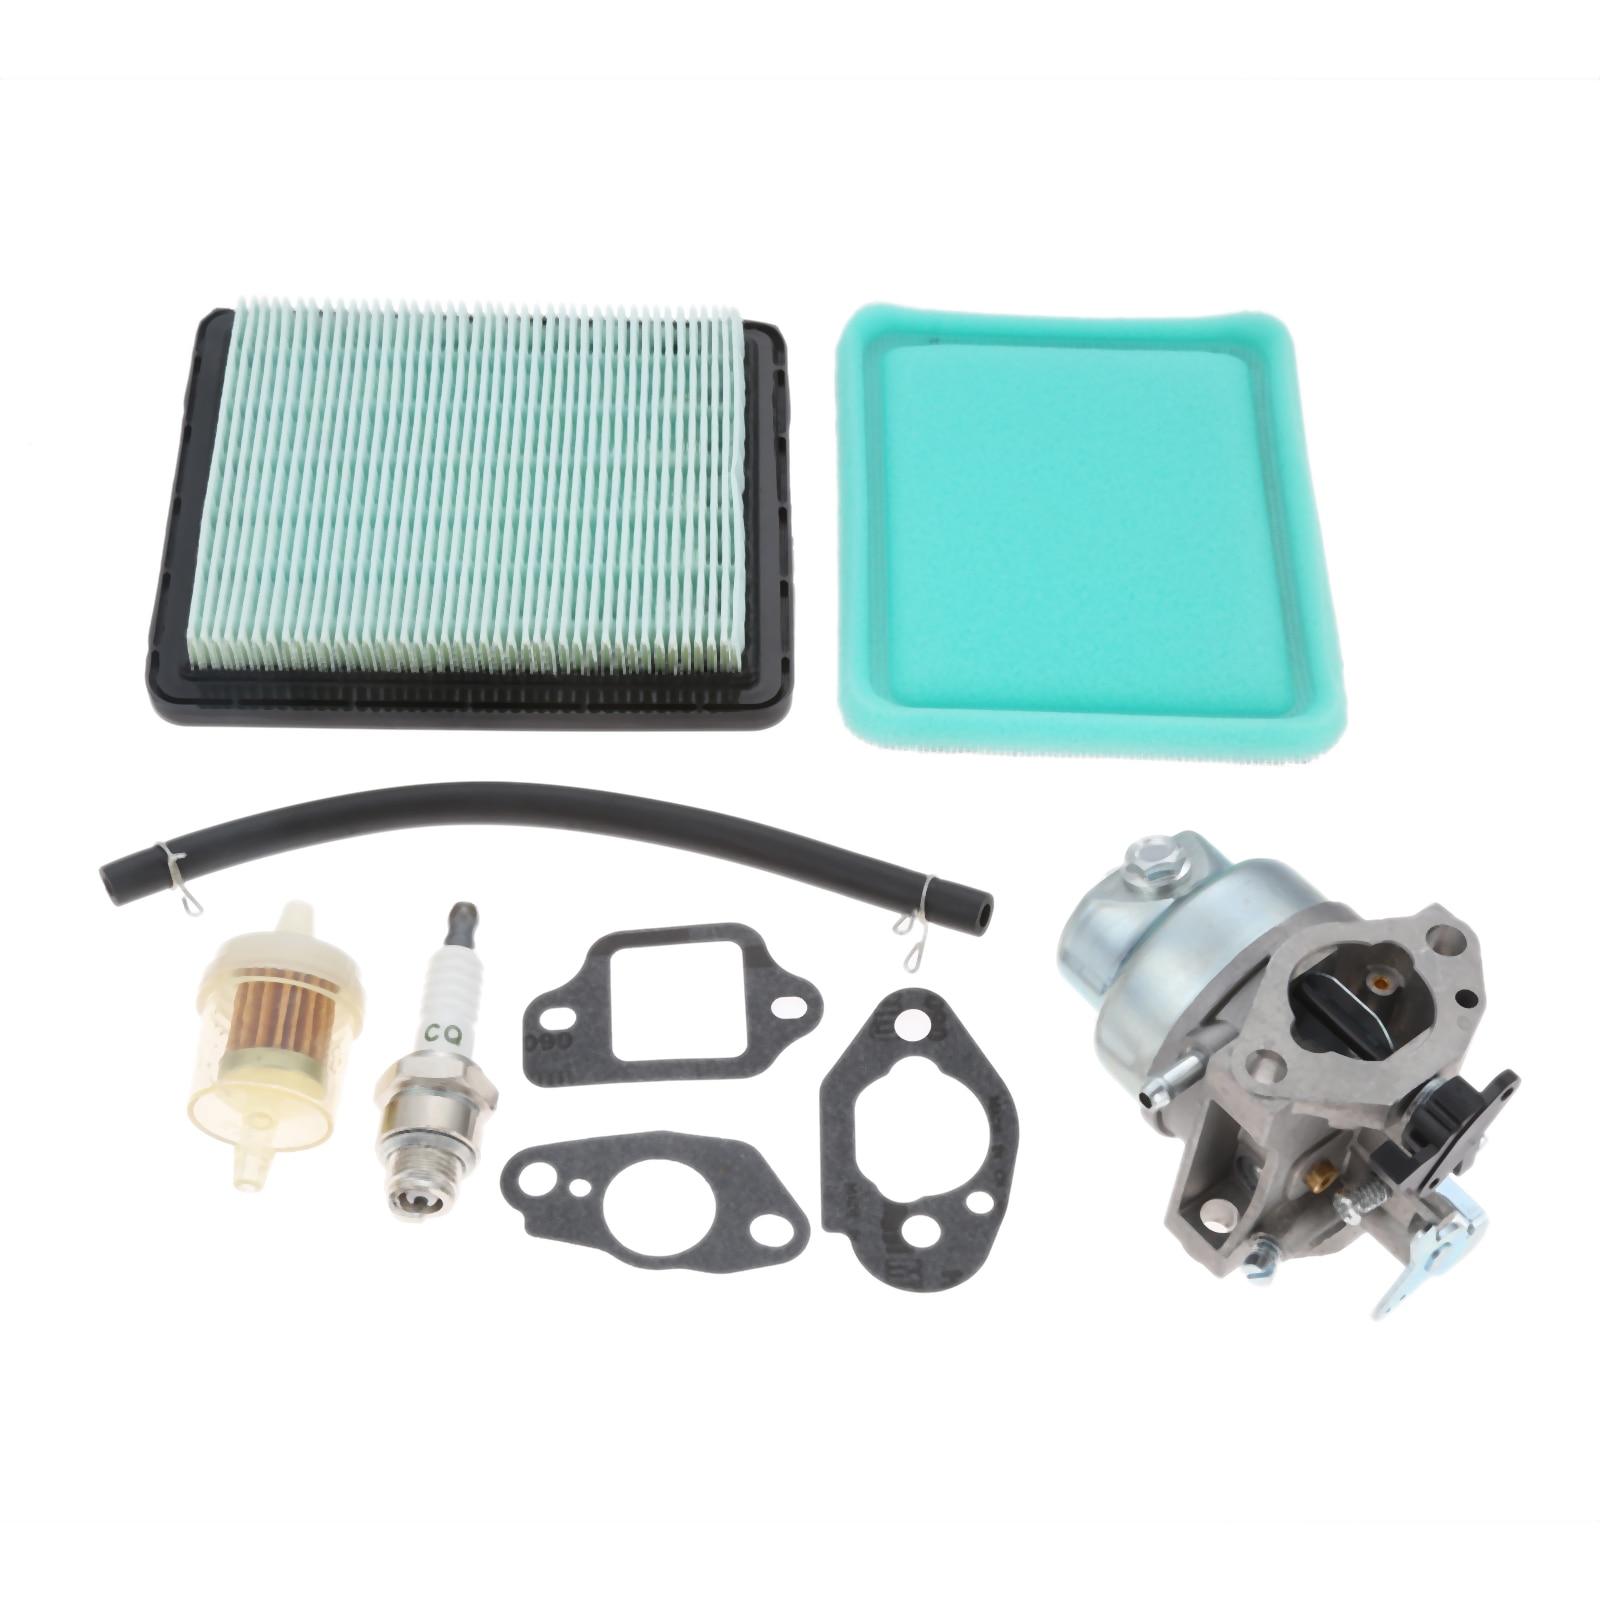 Air Pre Filter Cover Assy For Honda GX25 HHT25S w Primer Bulb Carb Repair Kit